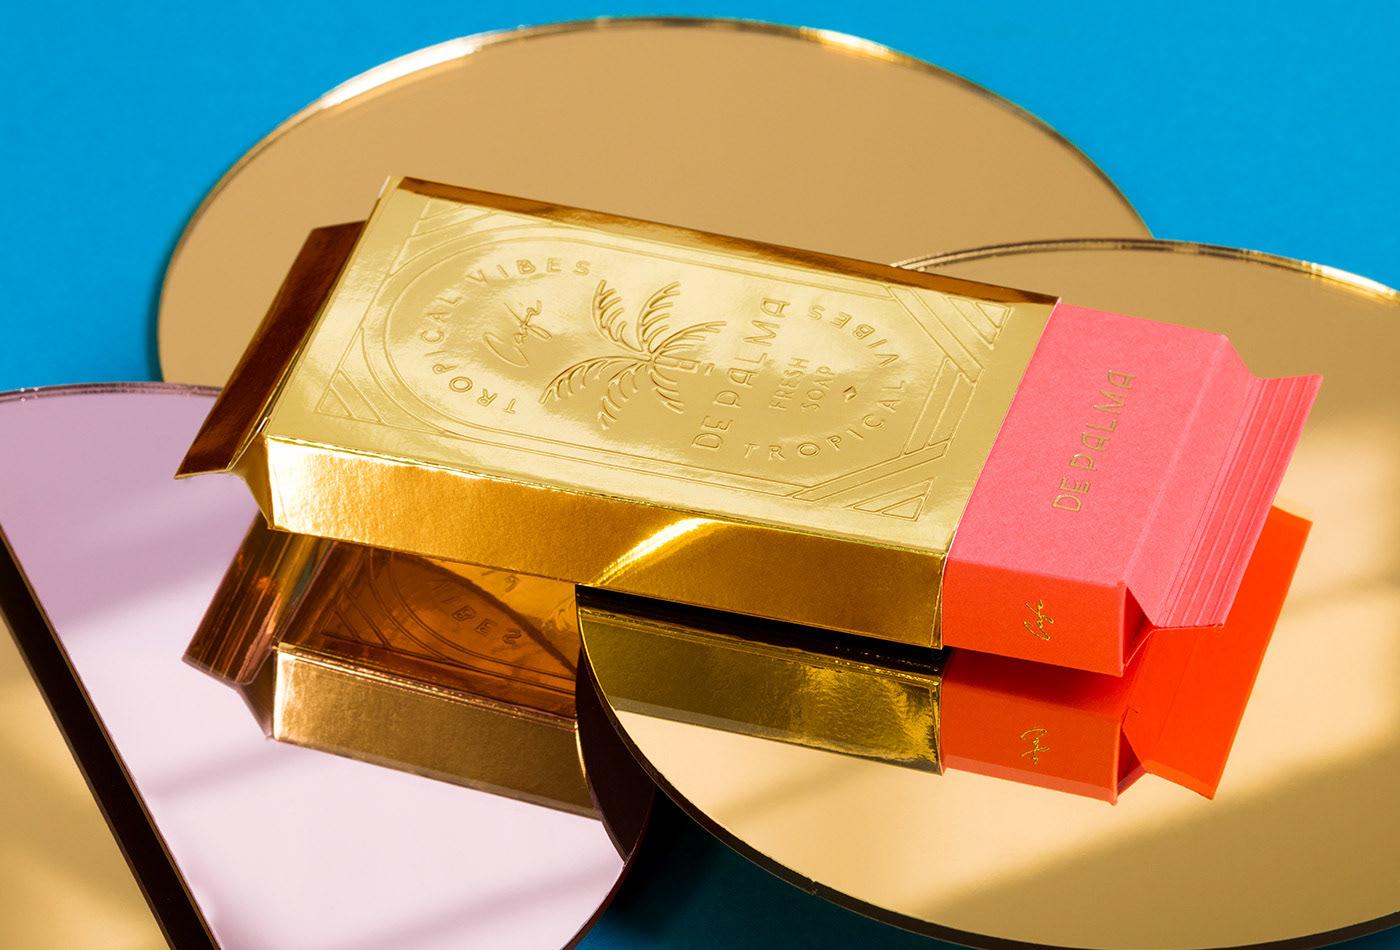 Image may contain: box and gold